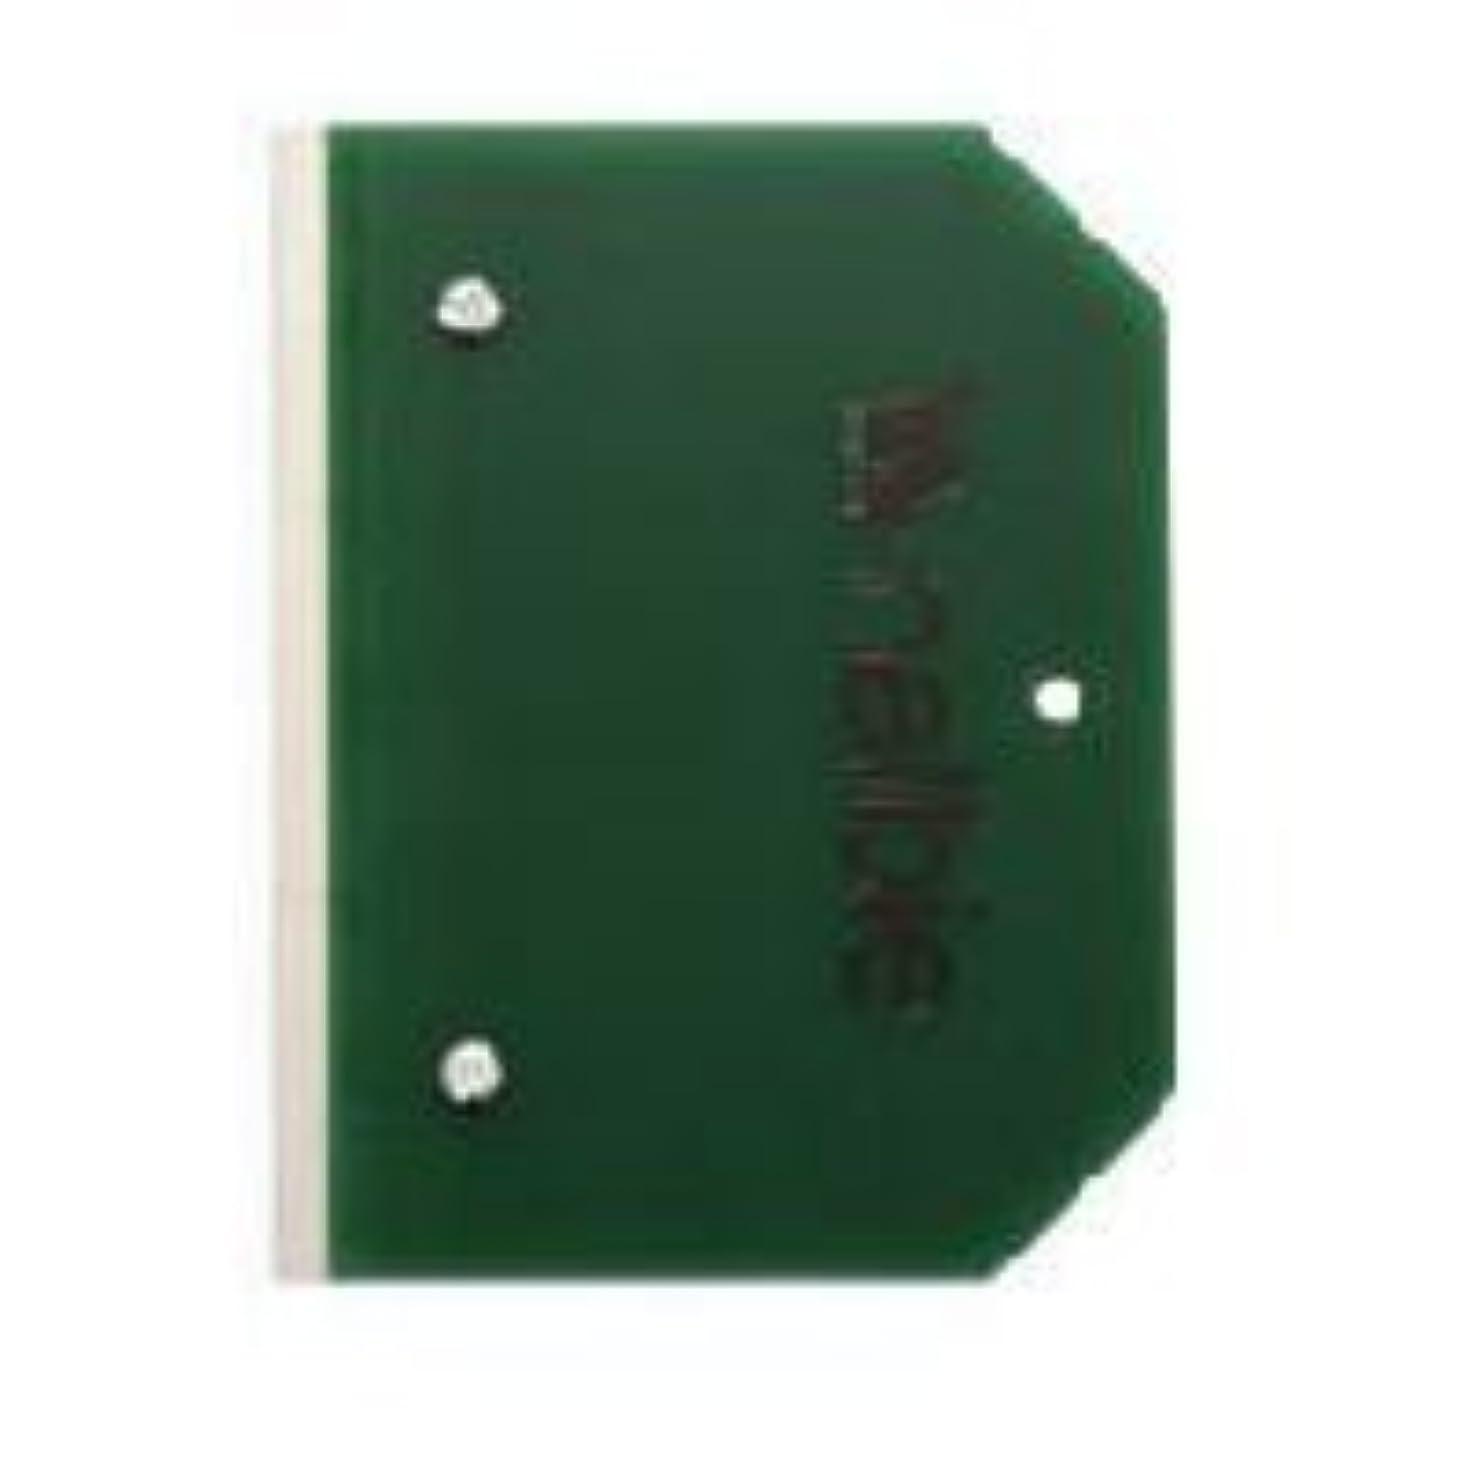 nalbie[ナルビー] カミソリホルダー 3枚刃/セーフティキャップ付 NRB03SC